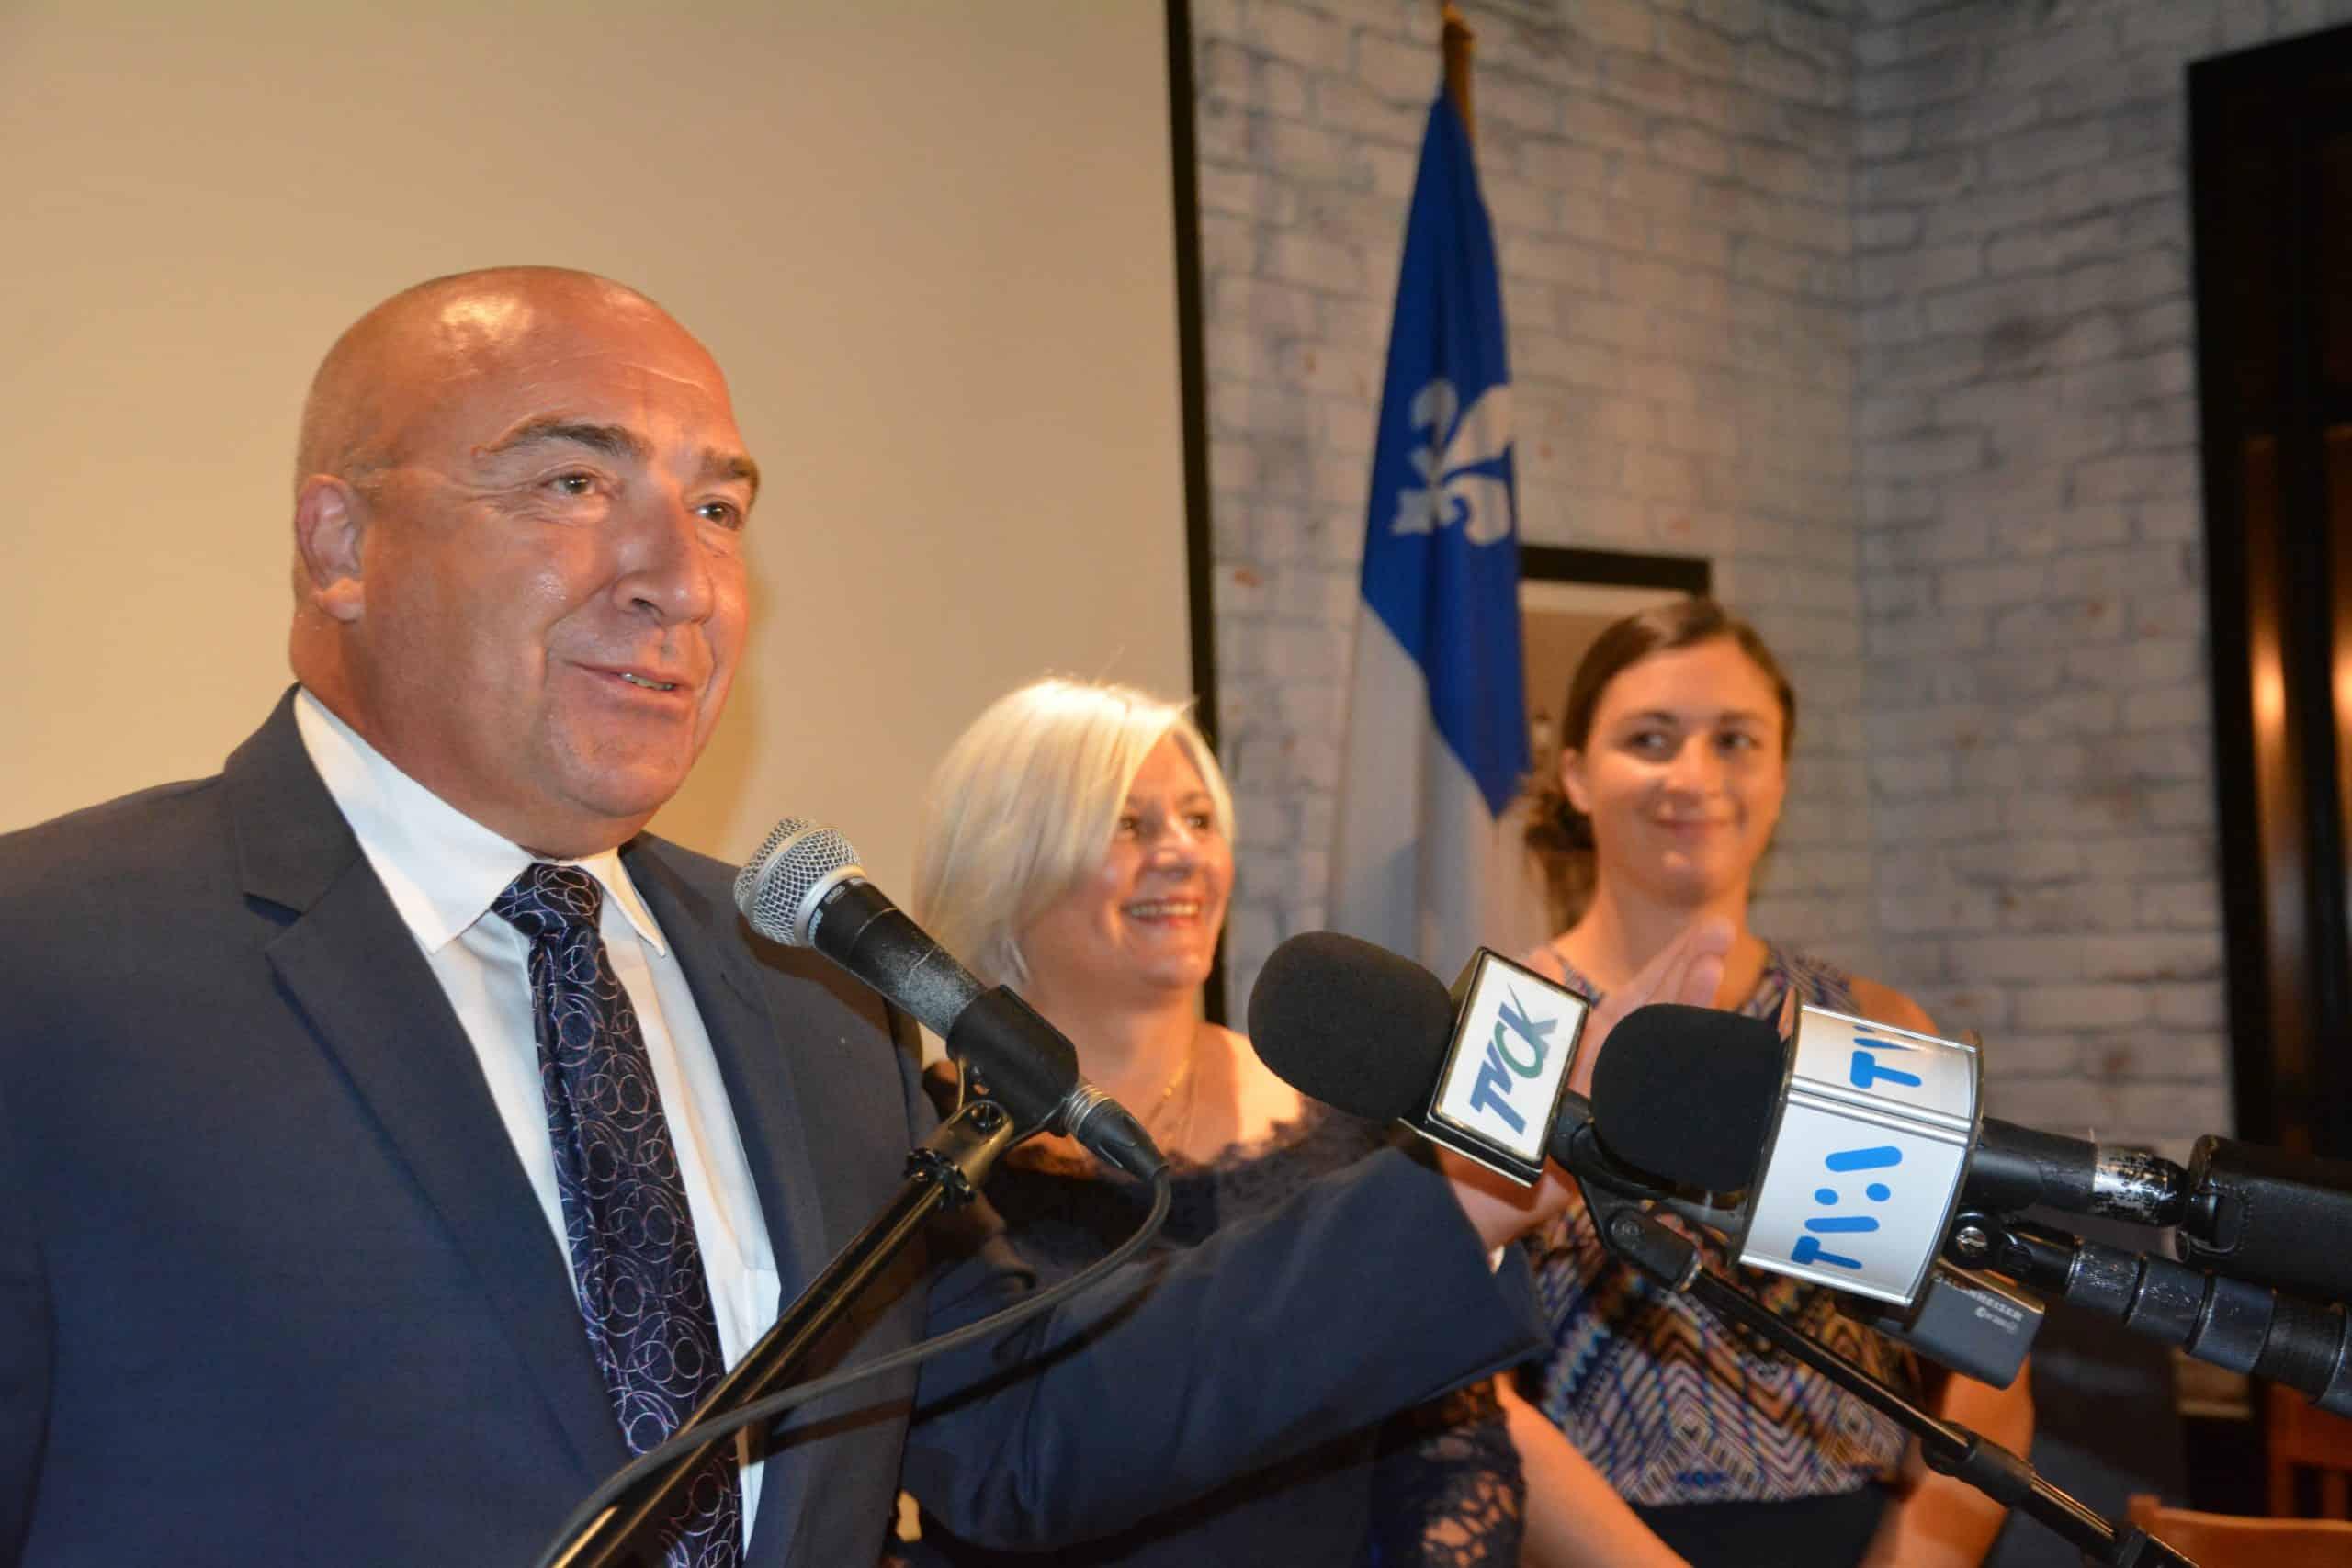 Élections fédérales : Bernard Généreux réélu dans Montmagny—L'Islet—Kamouraska—Rivière-du-Loup